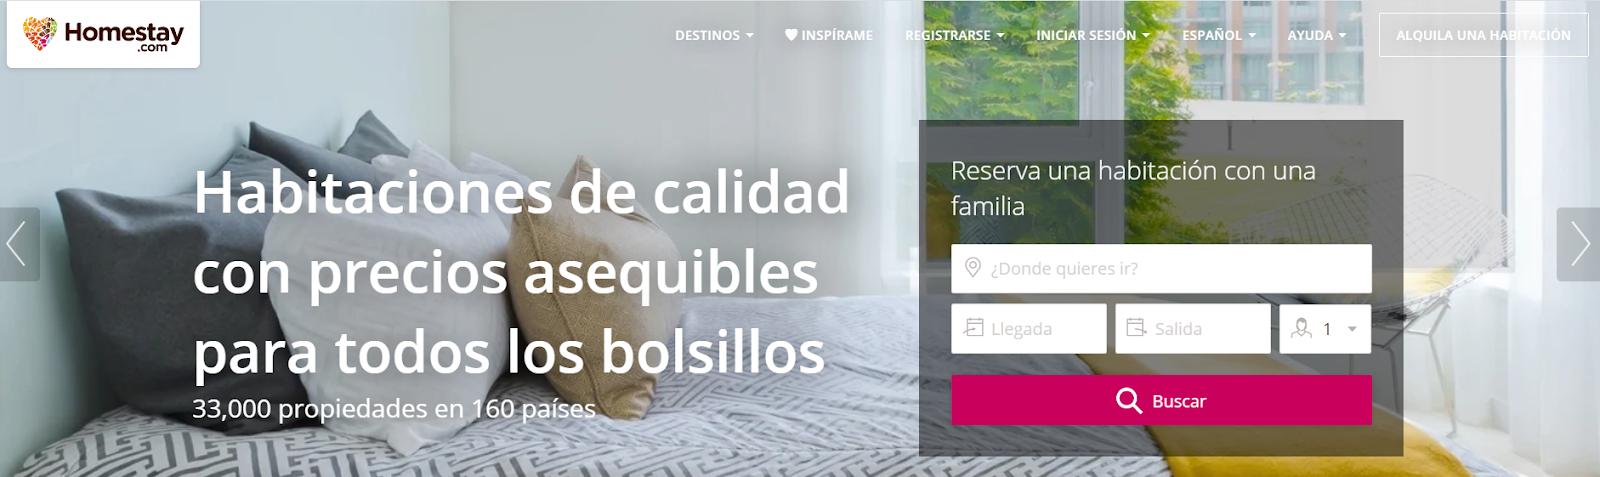 alternativas a Airbnb Homestay